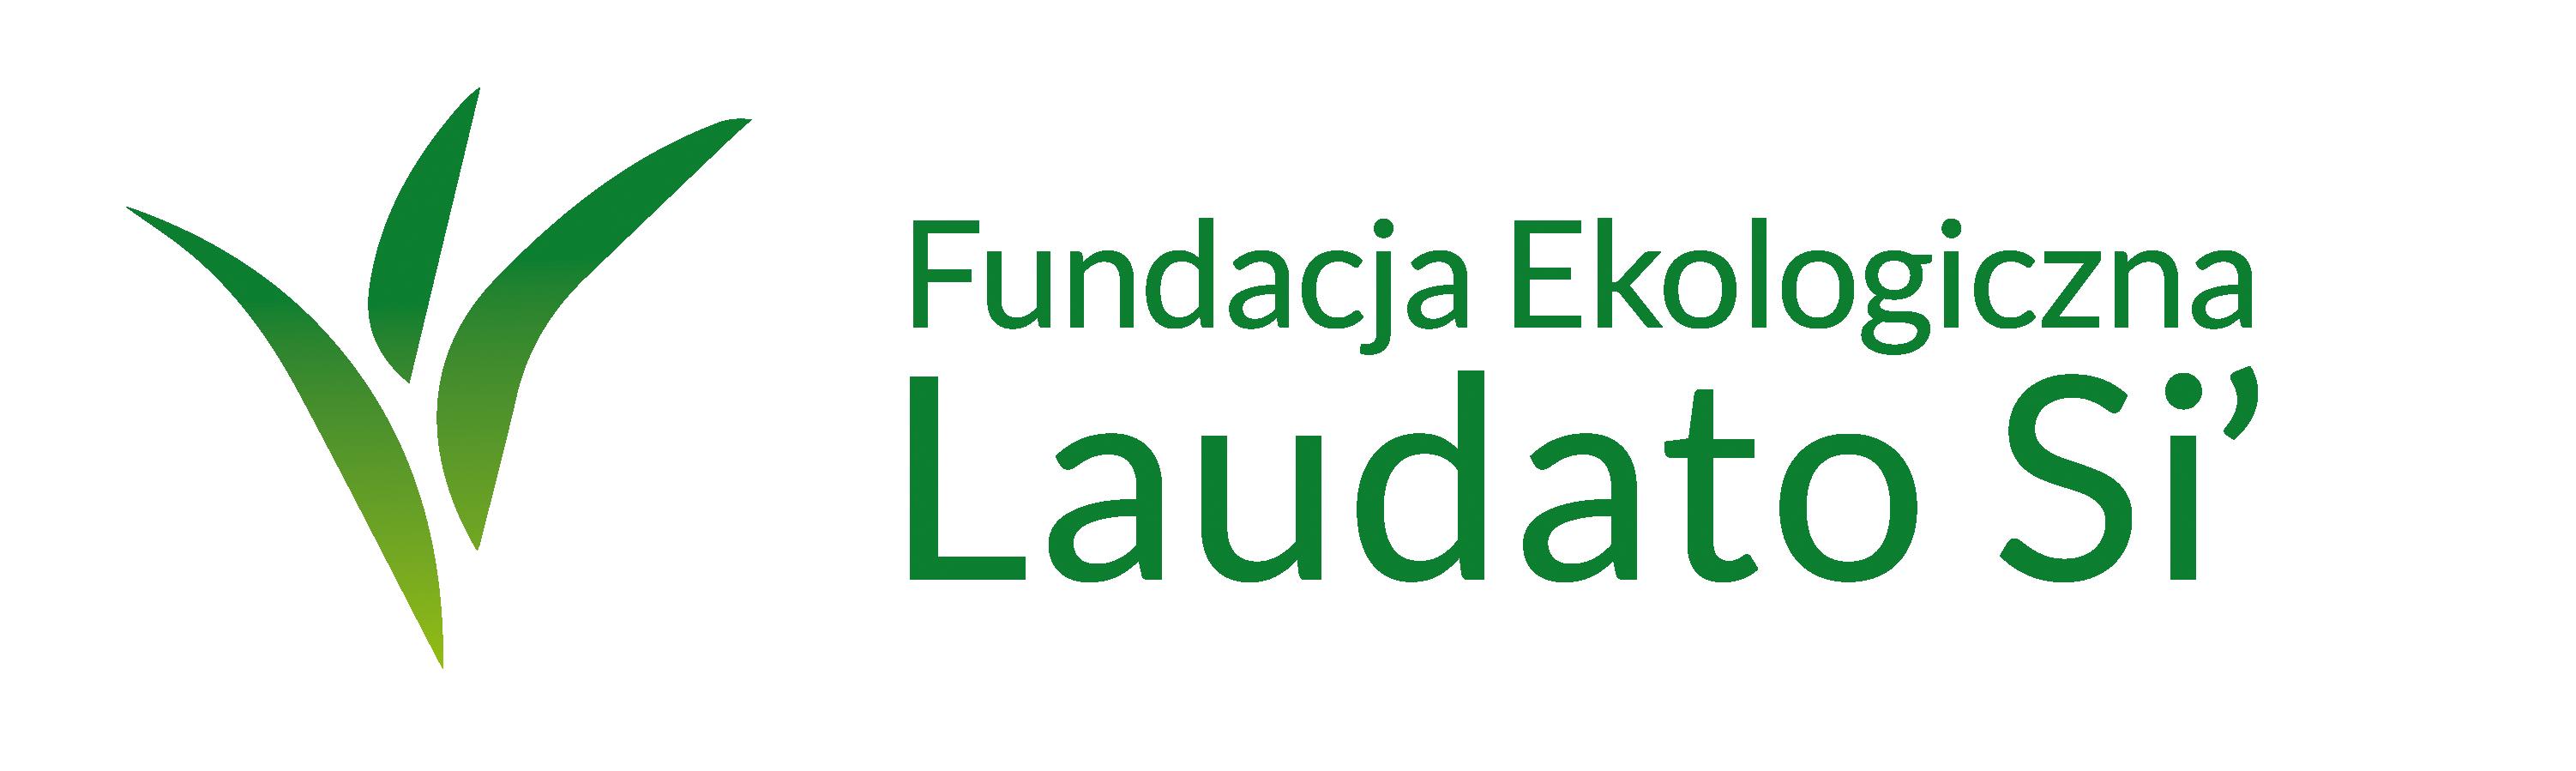 "Fundacja Ekologiczna ""Laudato Si"""